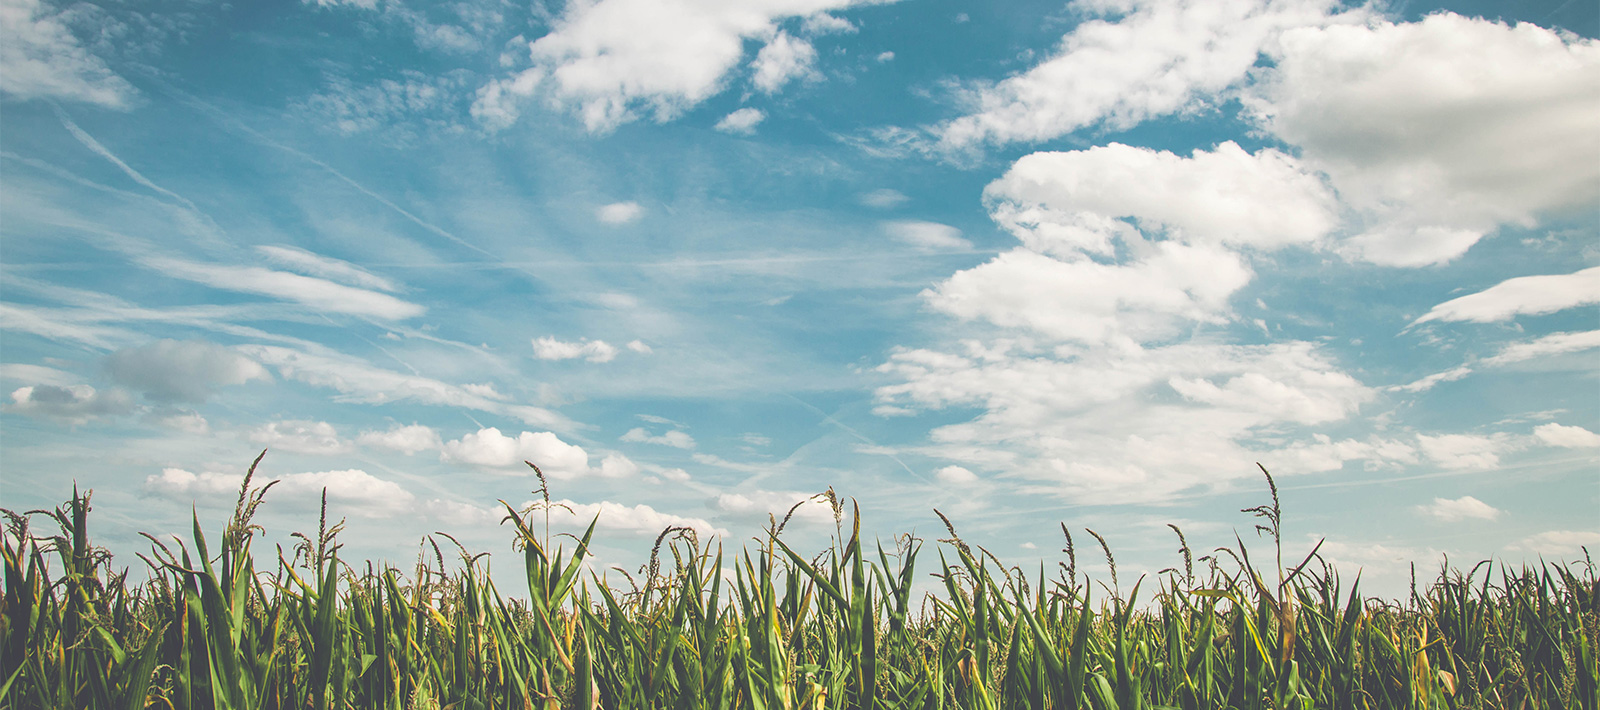 corn-field-top